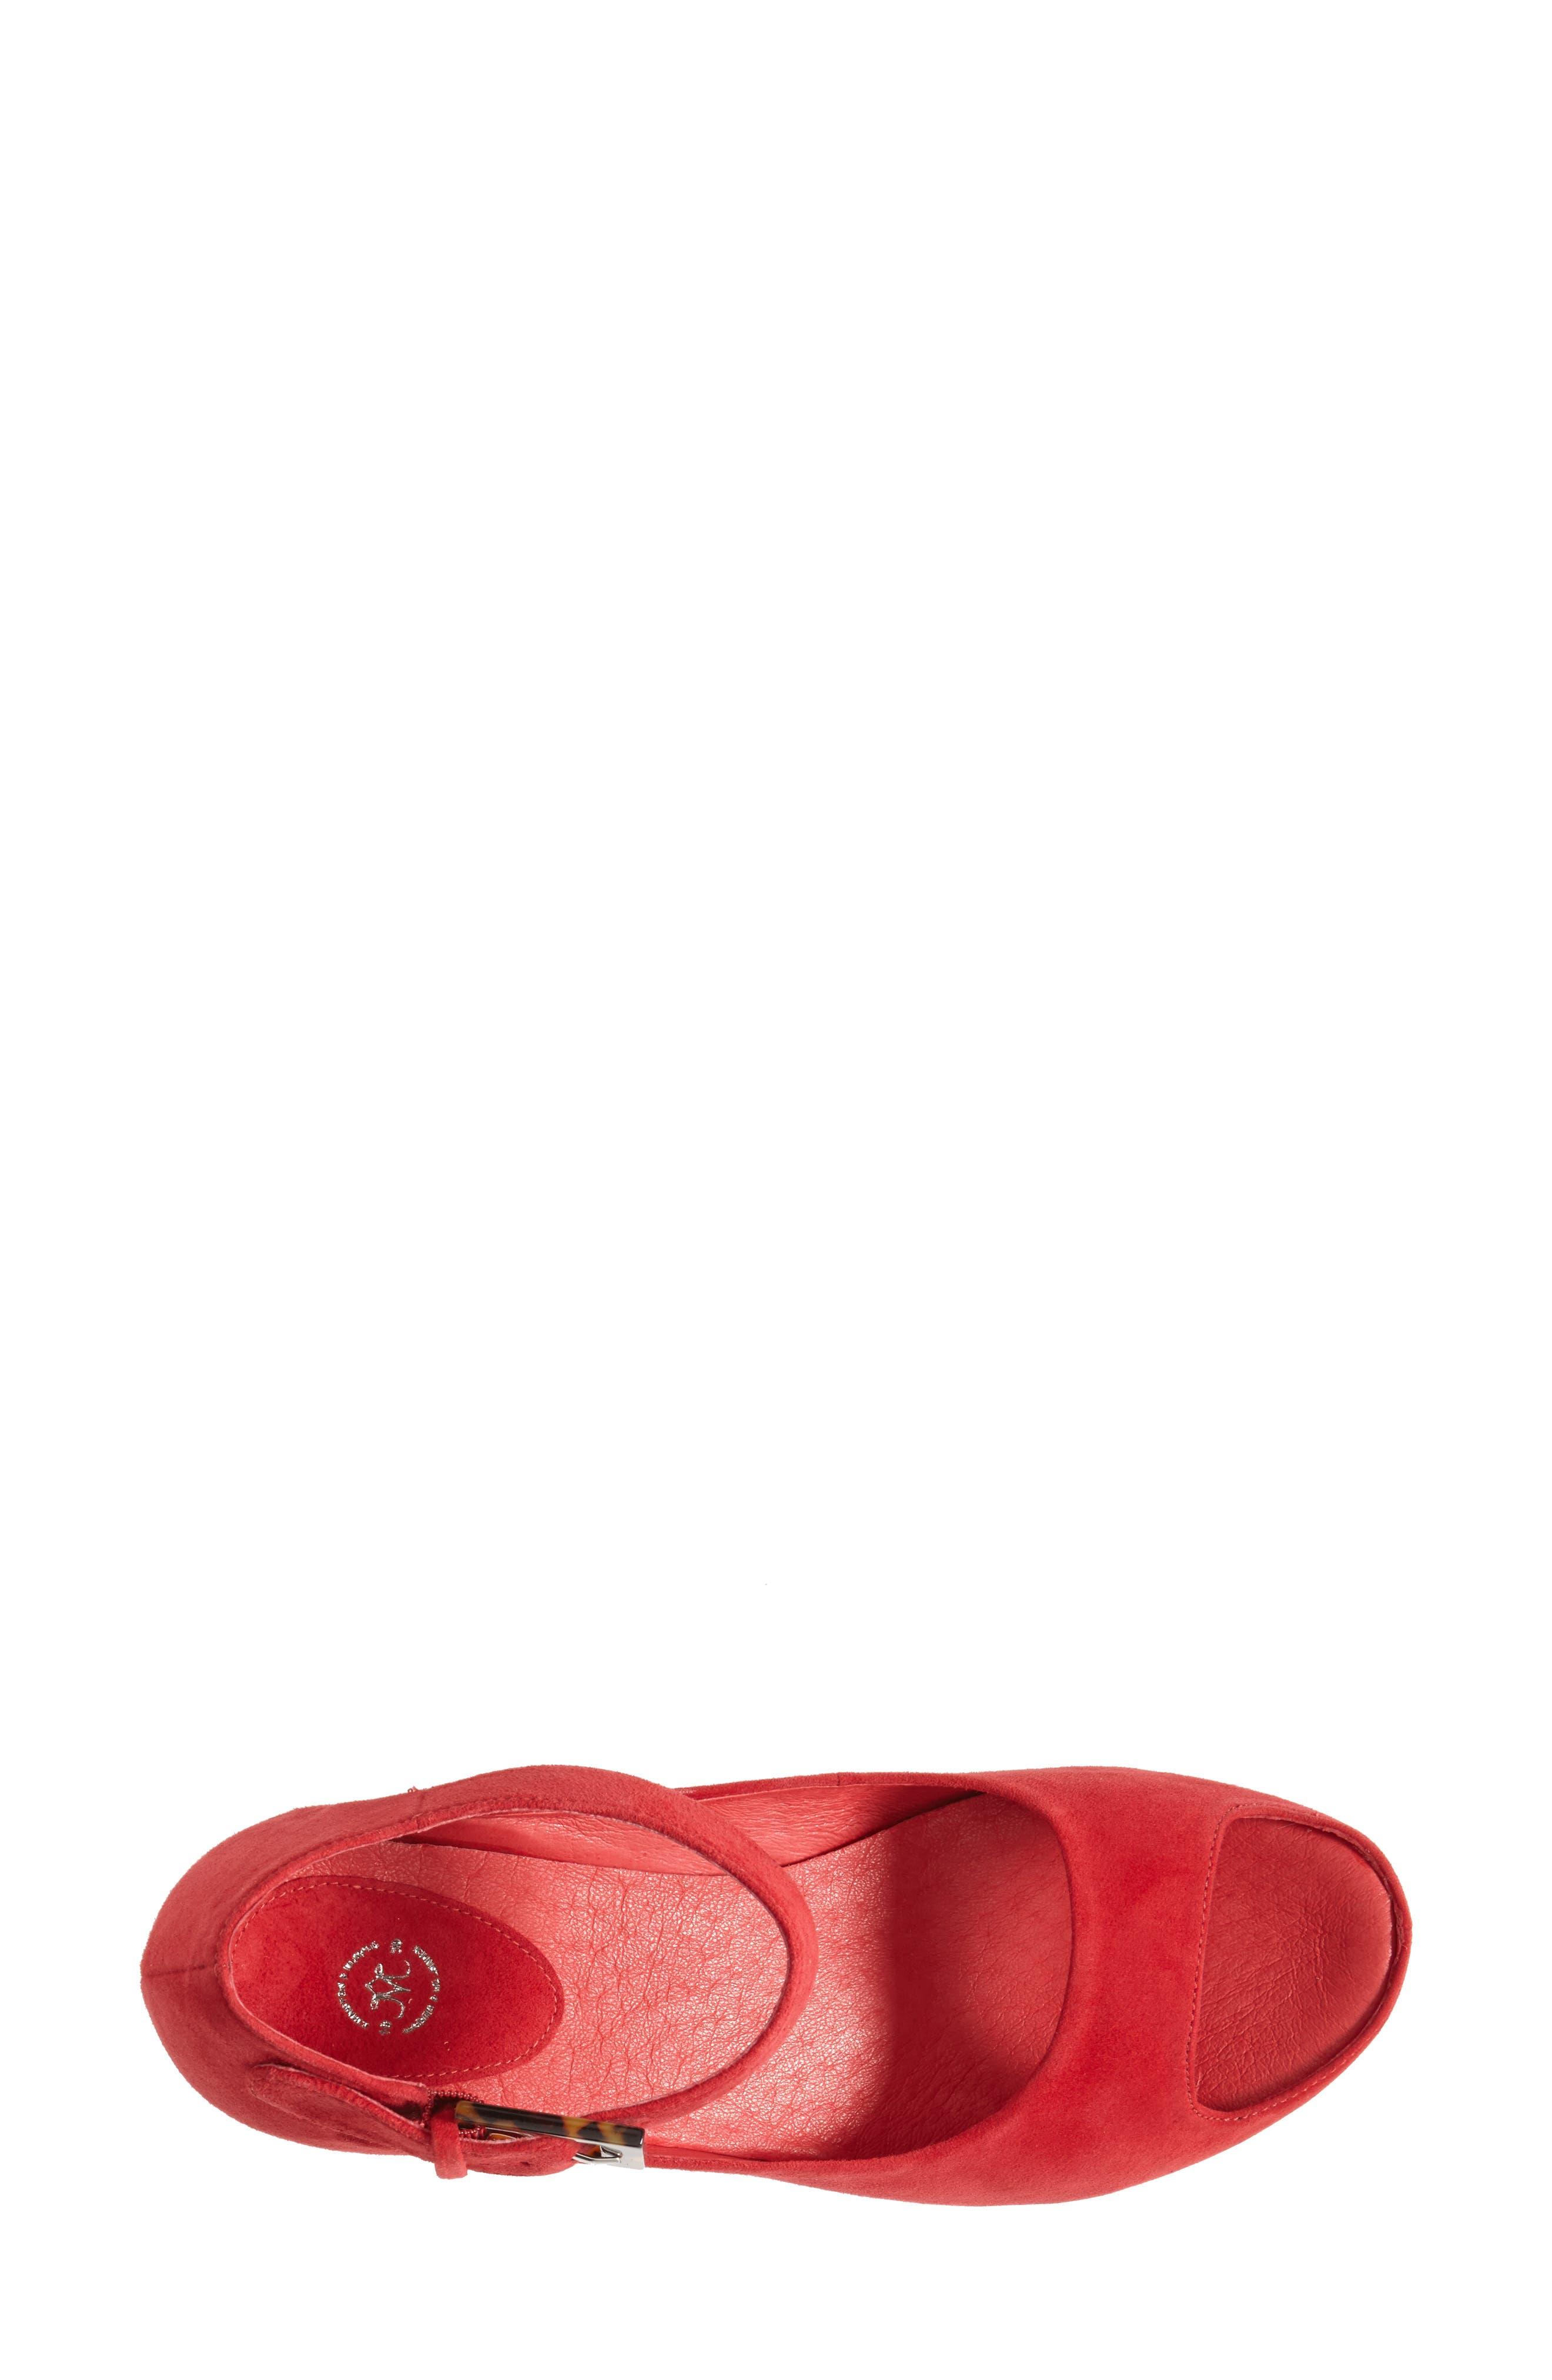 'Tricia' Ankle Strap Sandal,                             Alternate thumbnail 18, color,